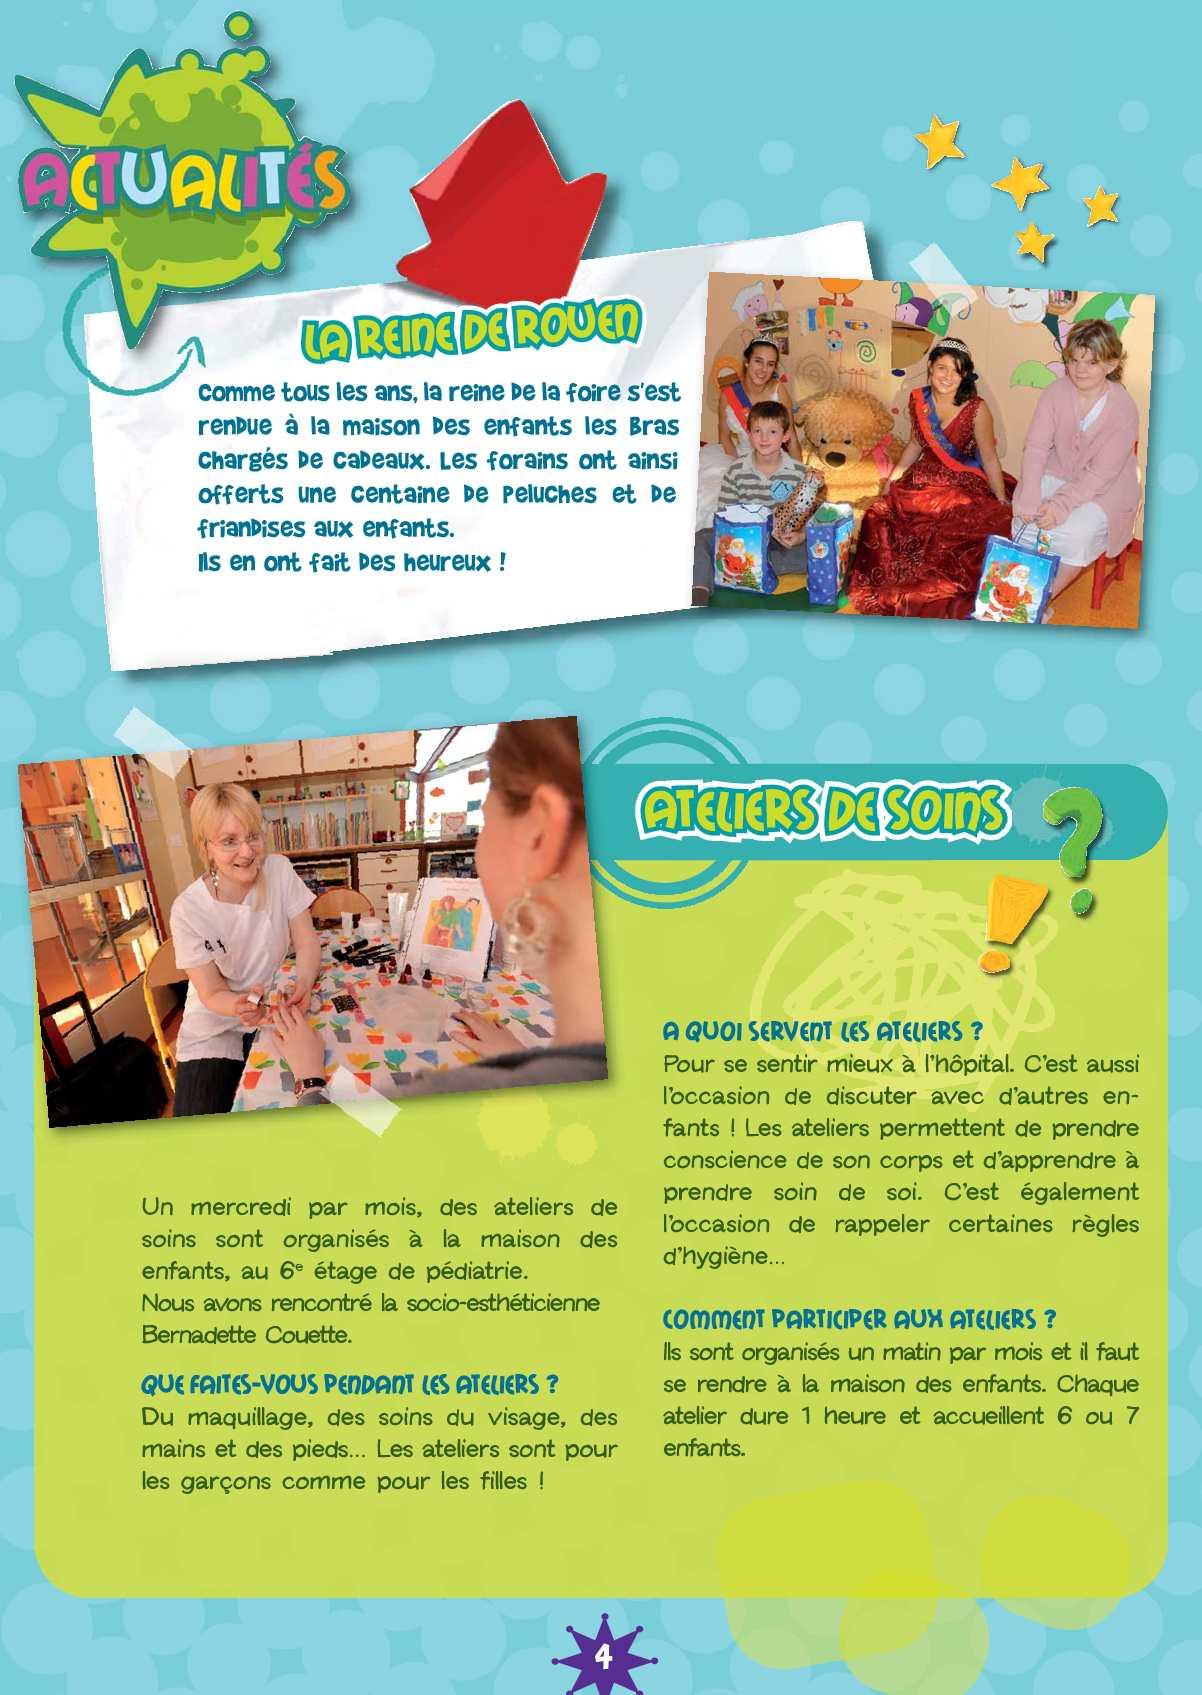 Les 4 Pieds Rouen canaill'news n°4 - magazine enfant chu de rouen - calameo